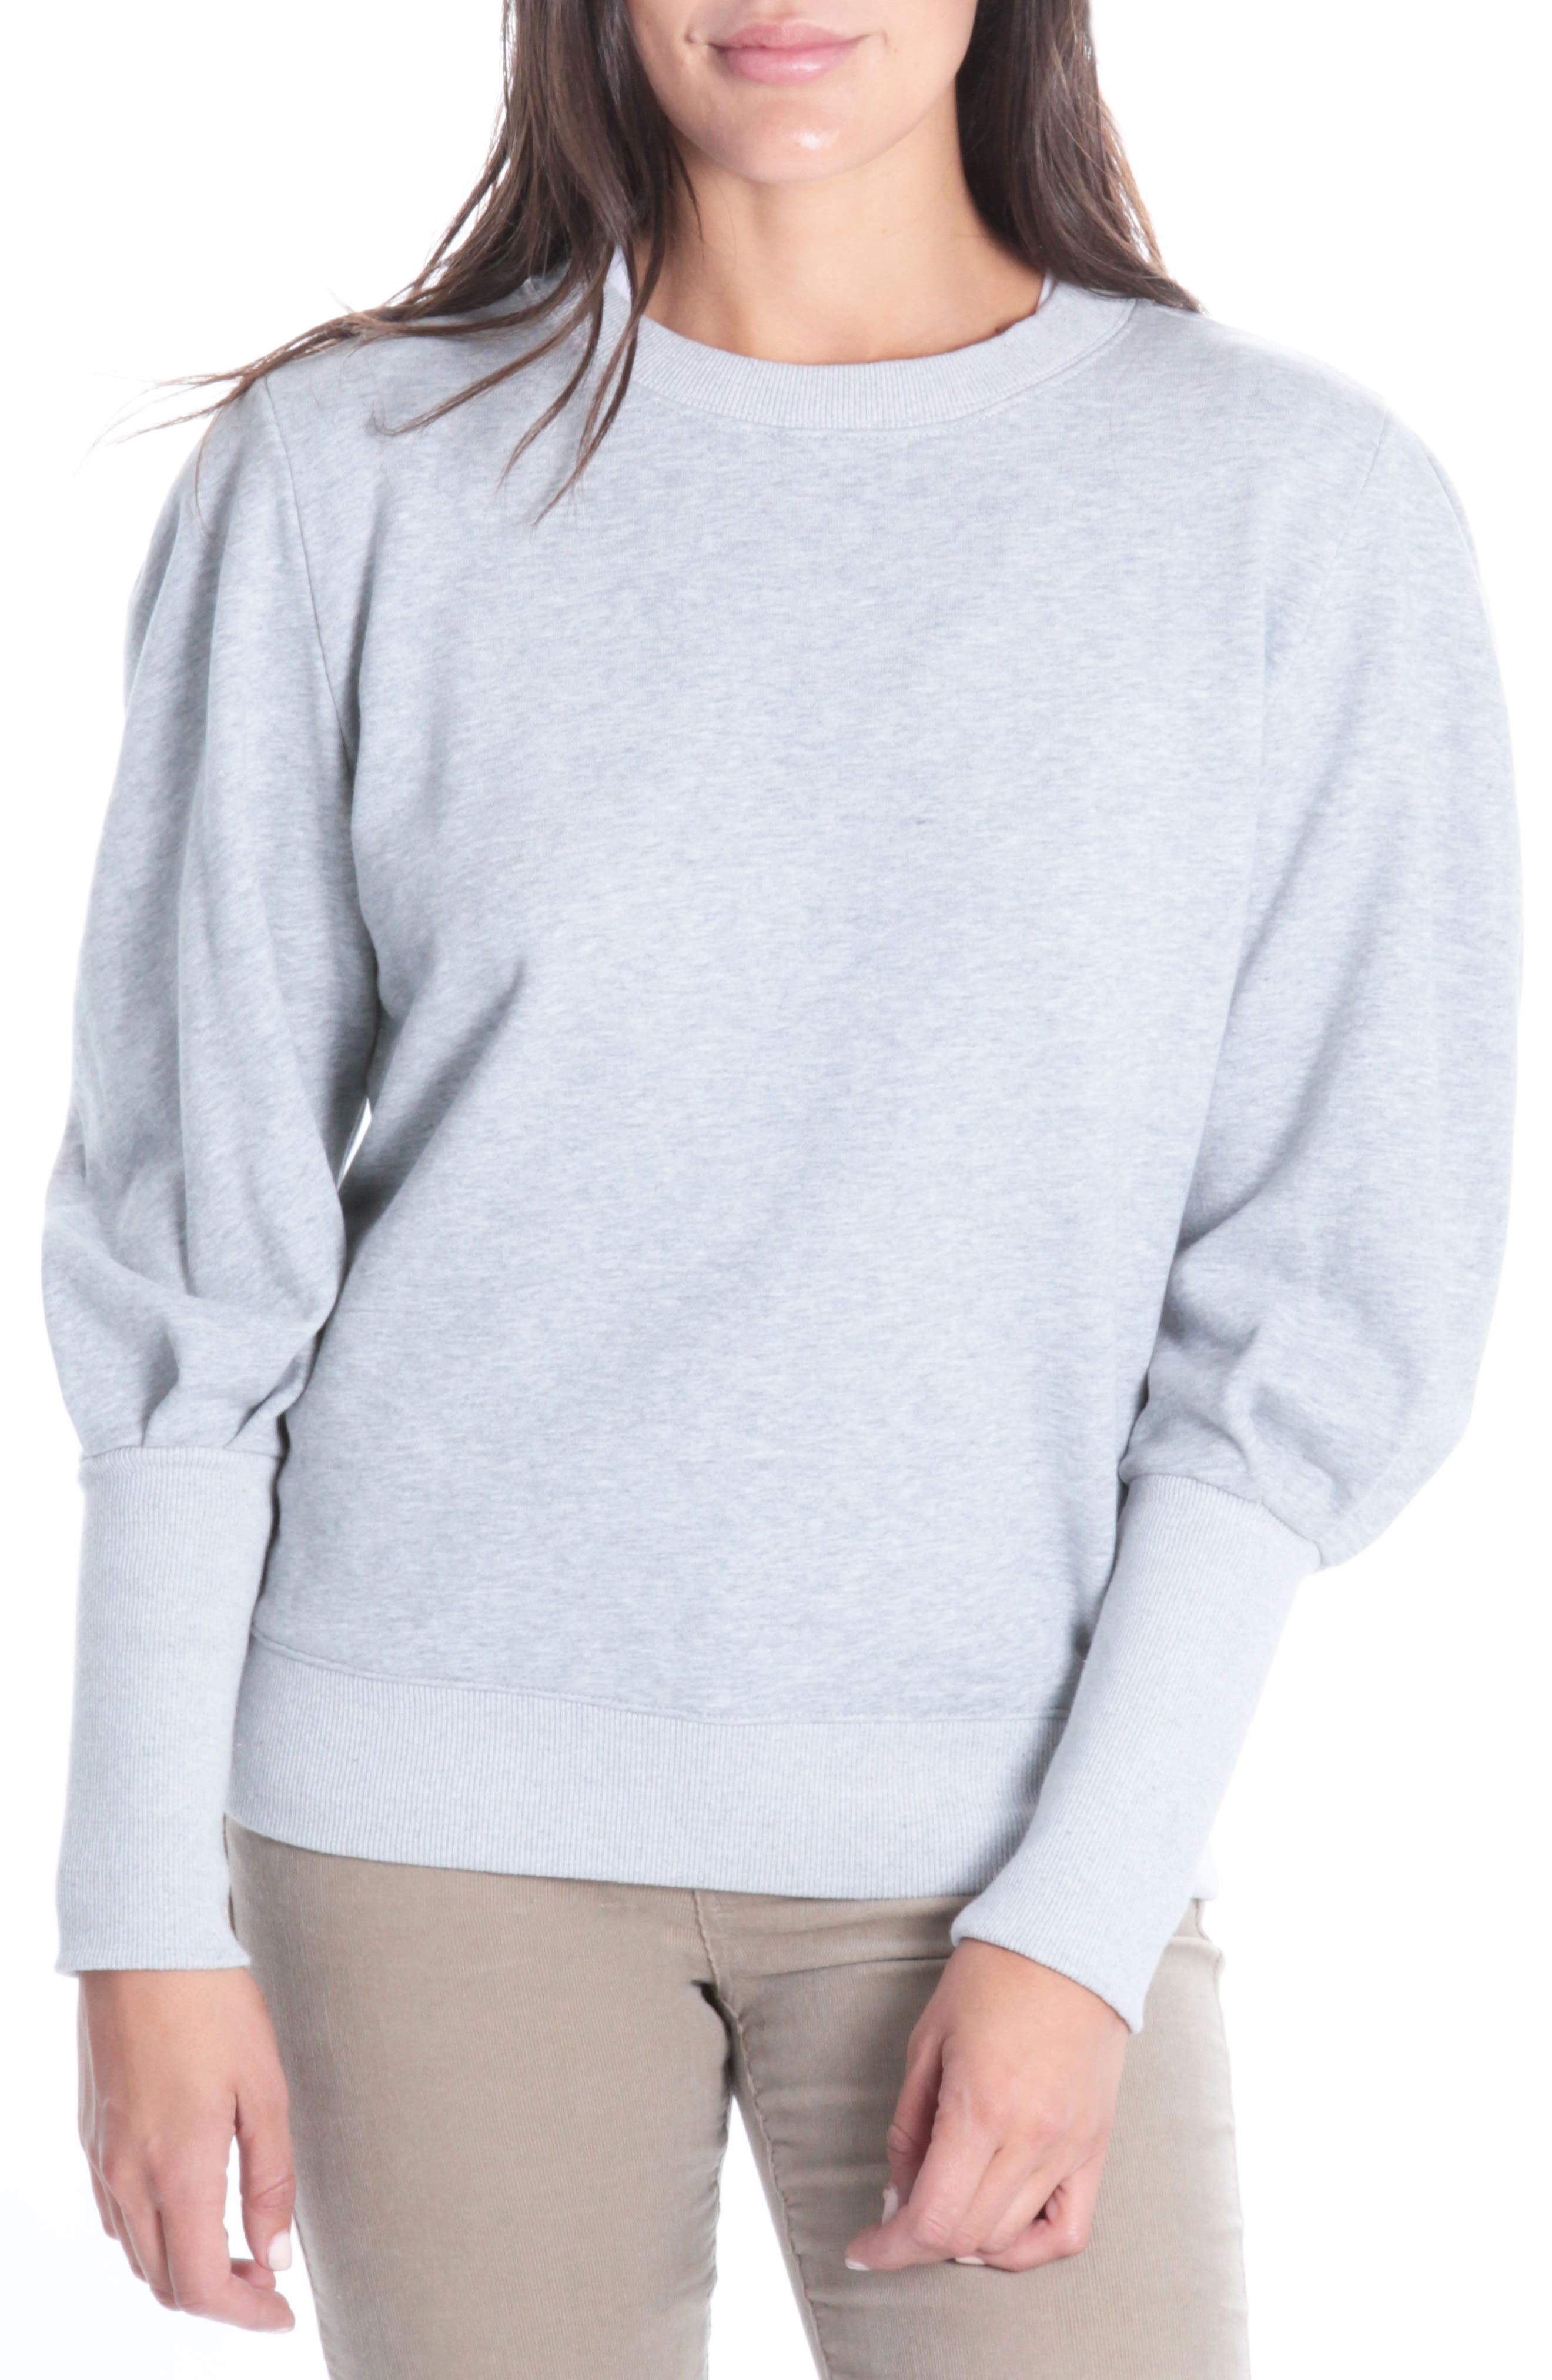 Lorena Knit Top,                         Main,                         color, 096